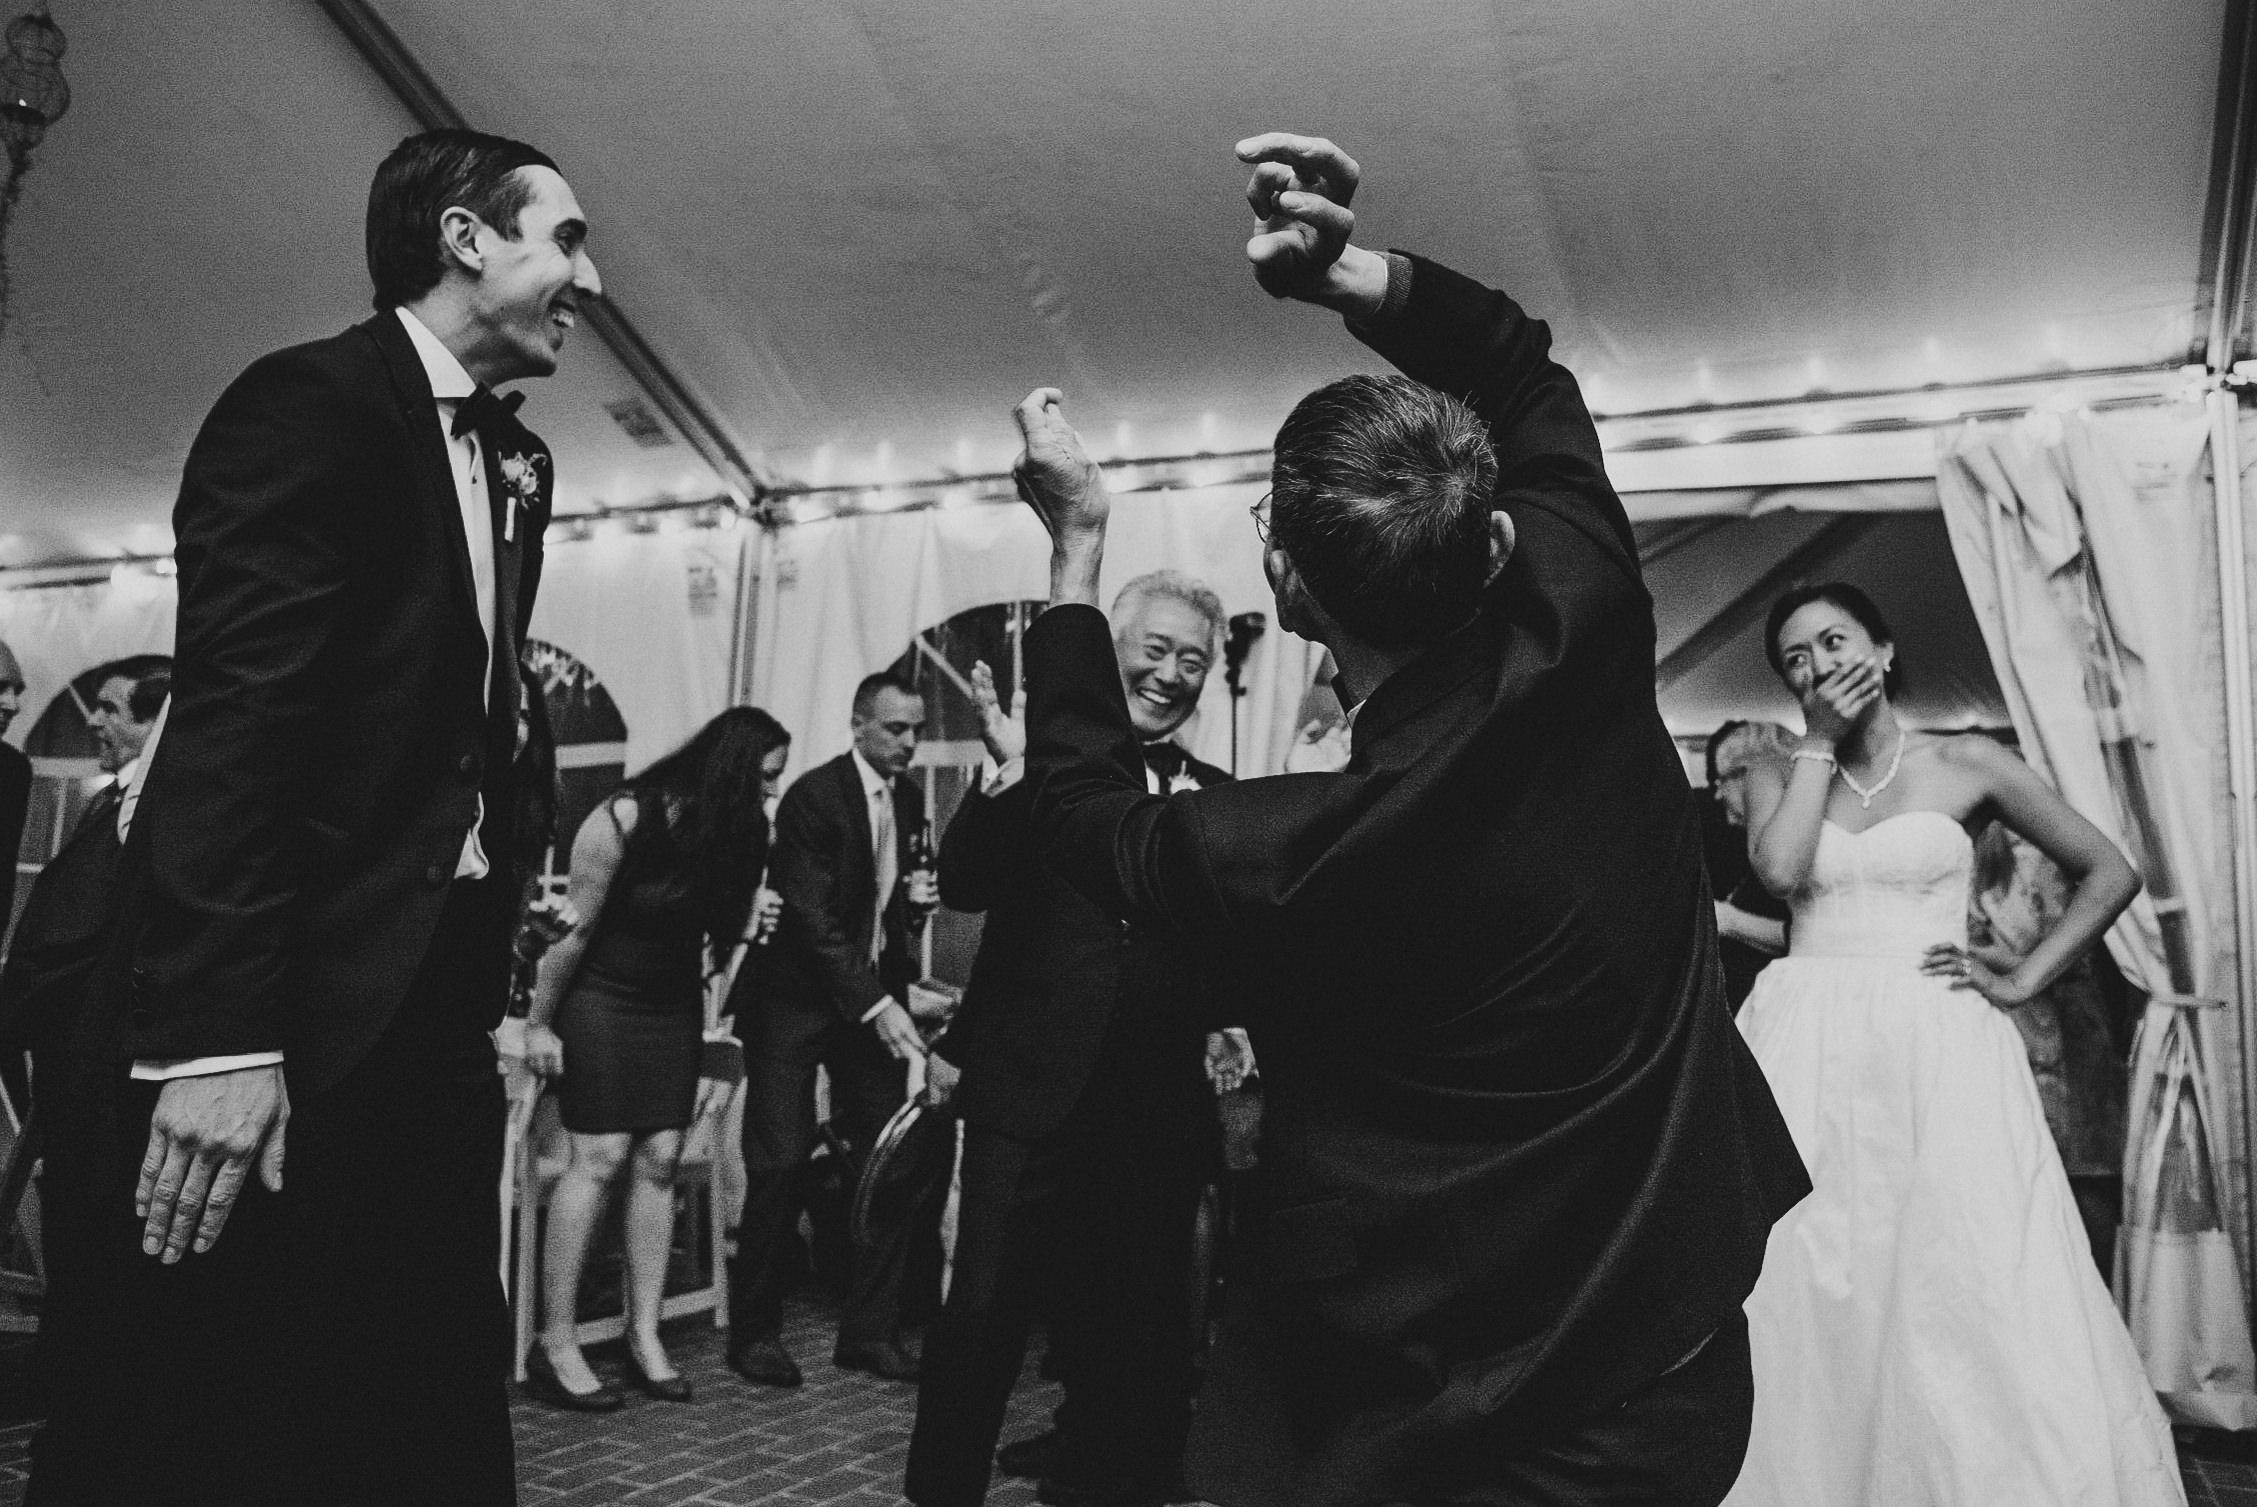 Wedding at Woodlawn Manor Sandy Spring Maryland by Mantas Kubilinskas-32.jpg